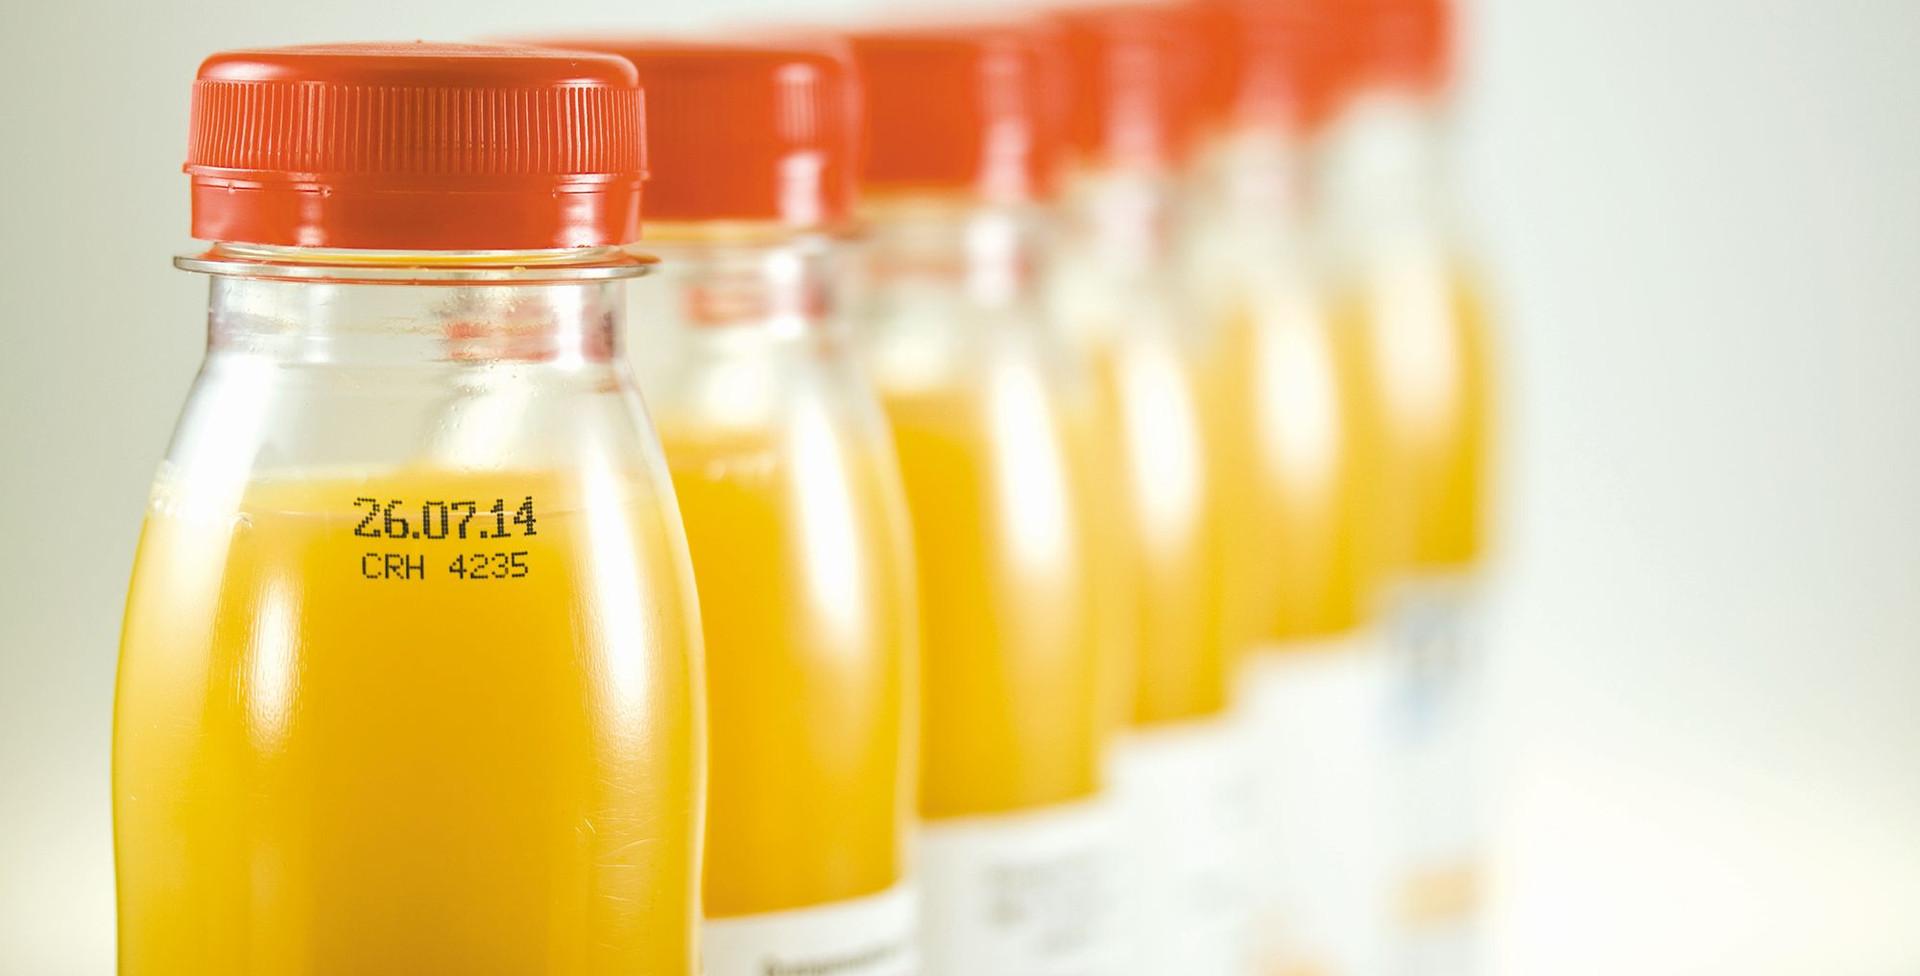 Leibinger - Juice